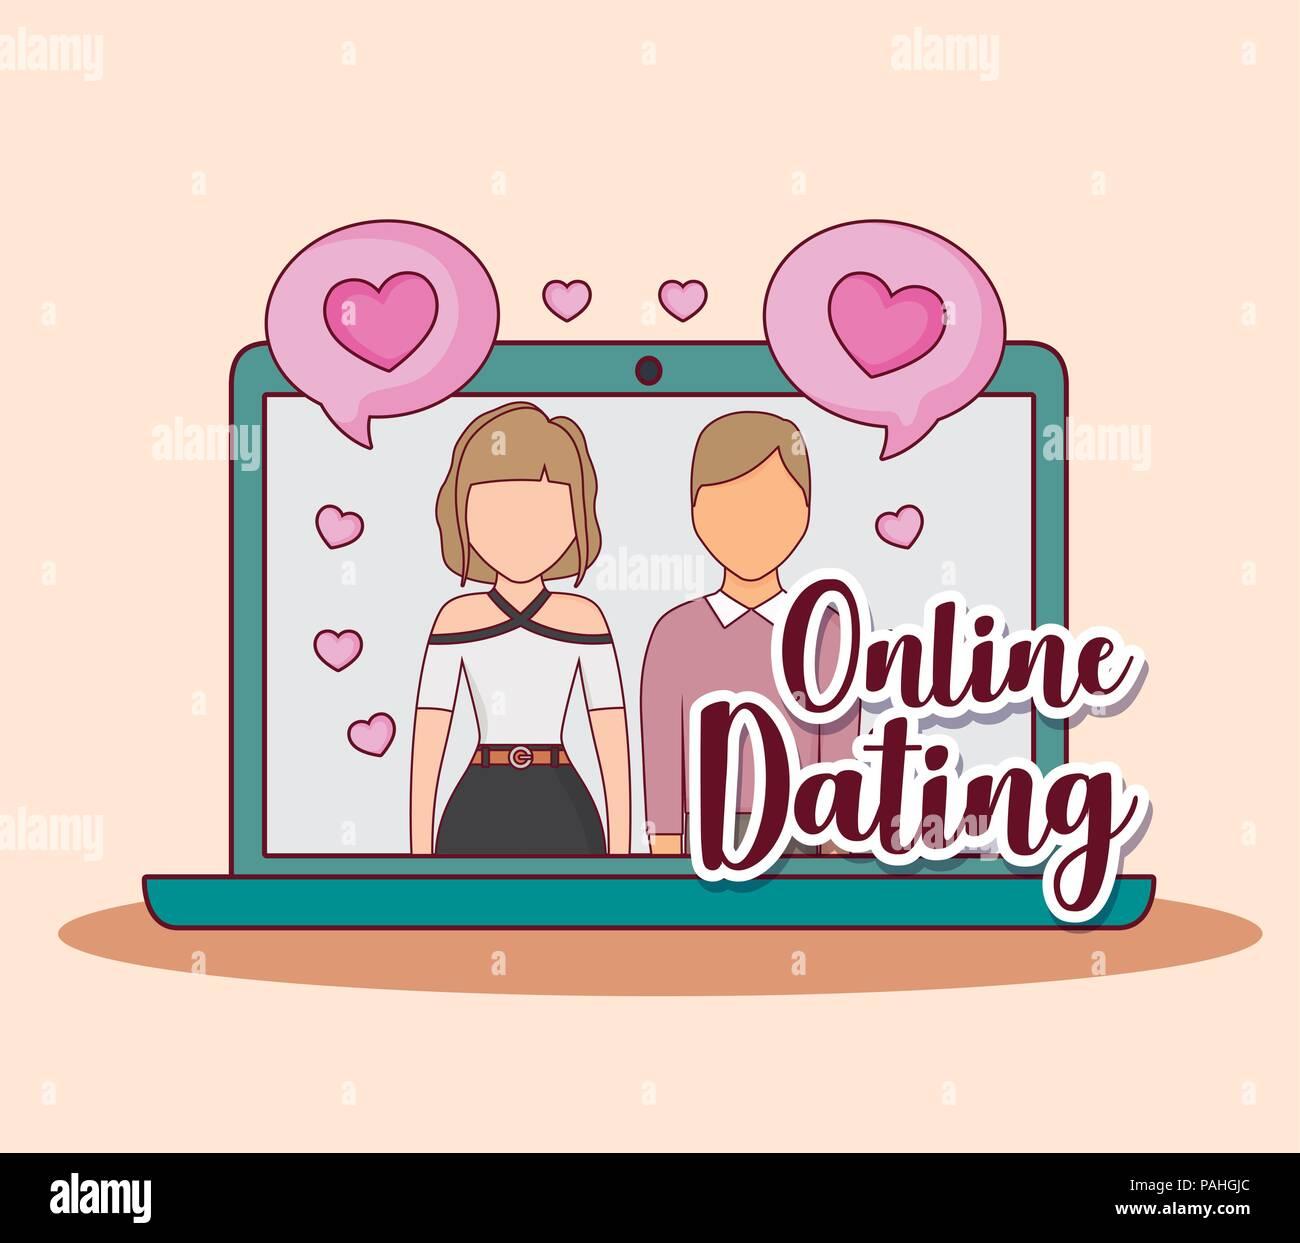 hg dating york stranice za upoznavanje